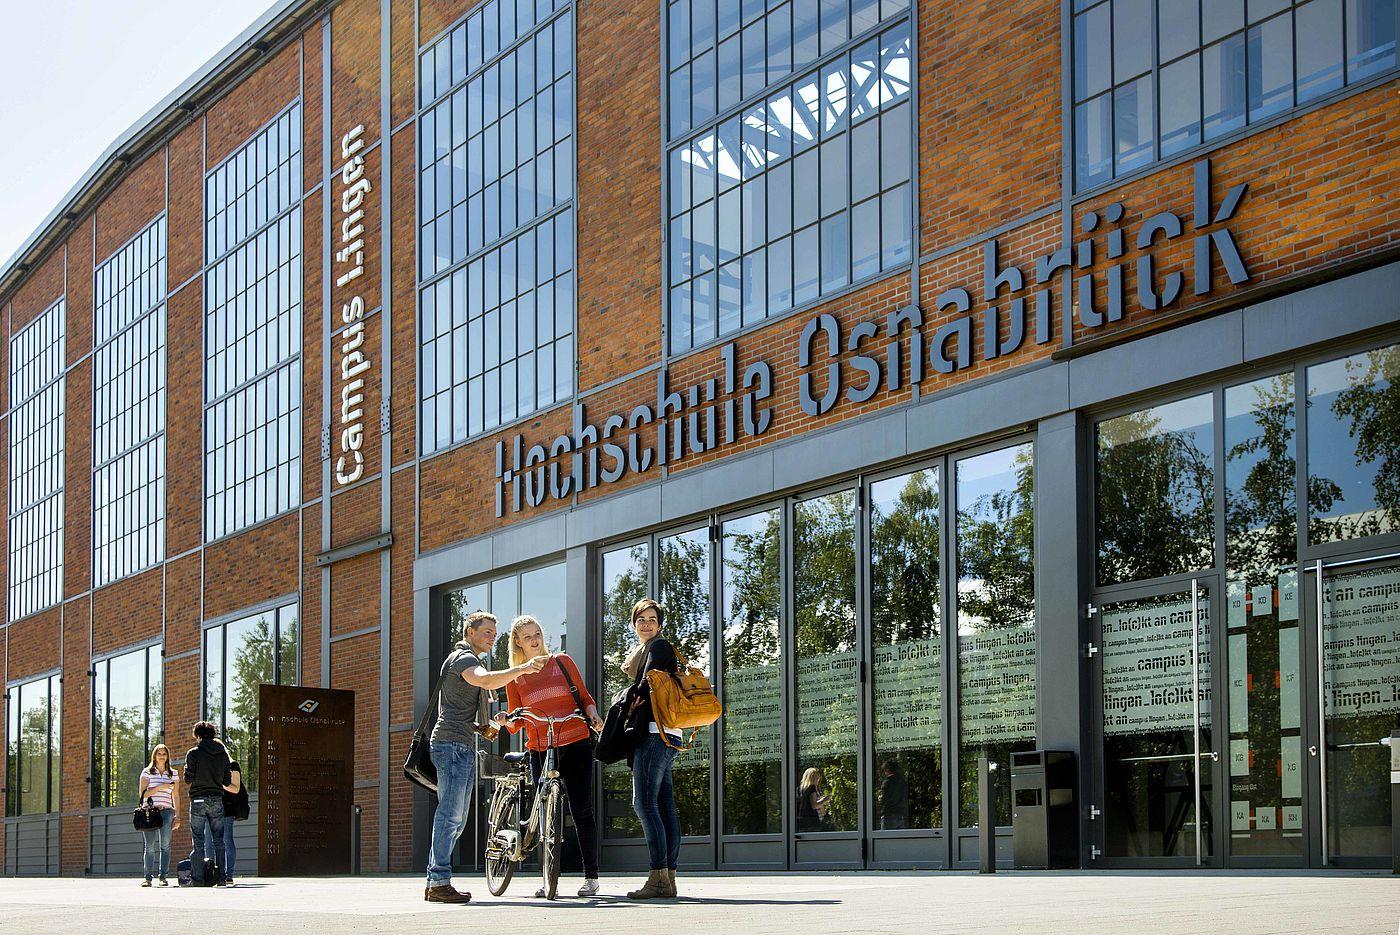 Docentes: convocatoria para dictar clases en Alemania